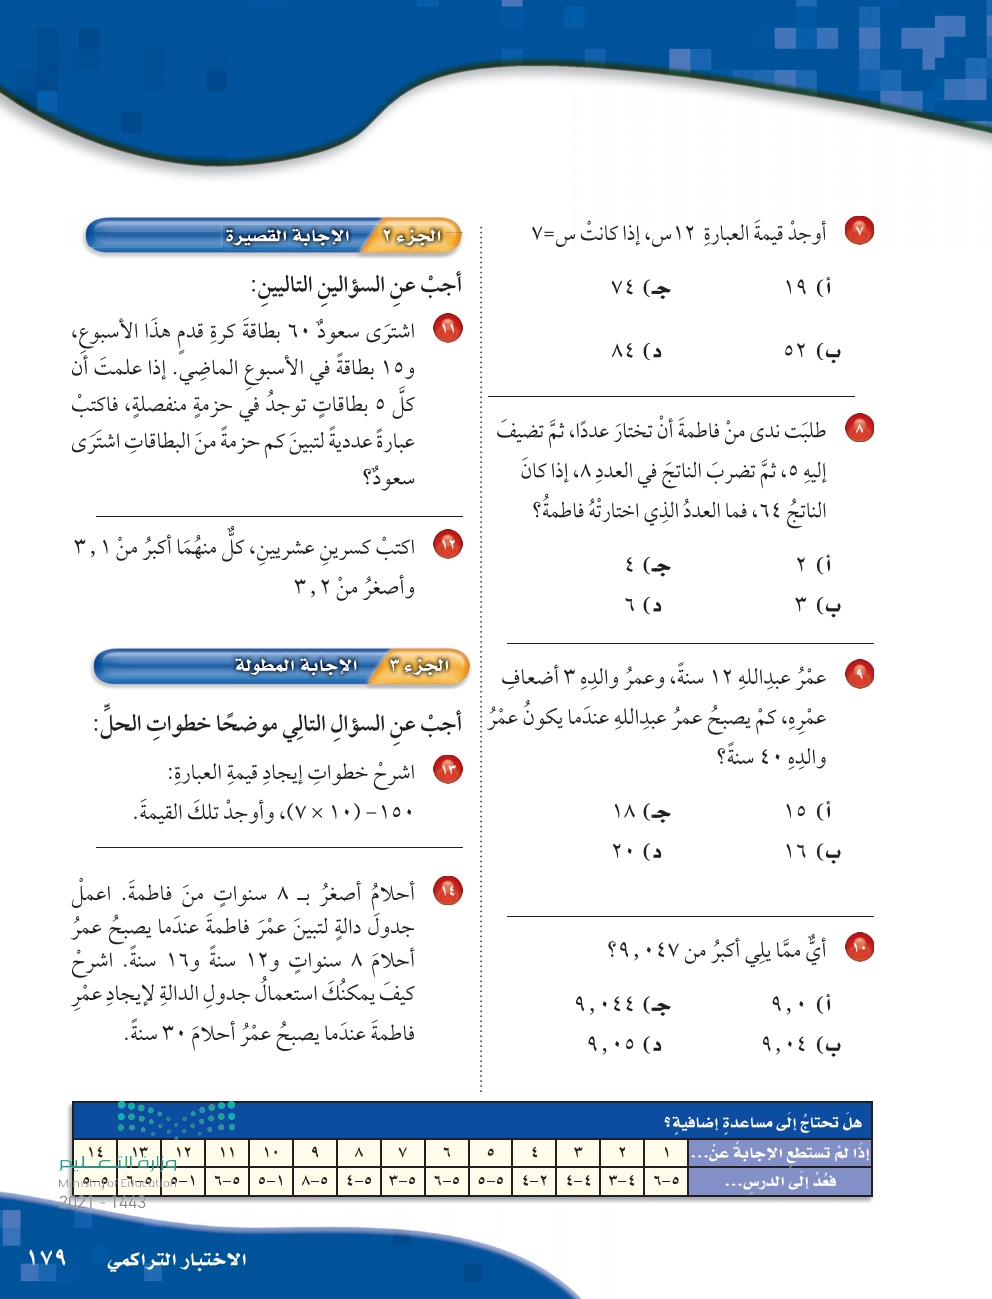 5-8 معادلات الضرب